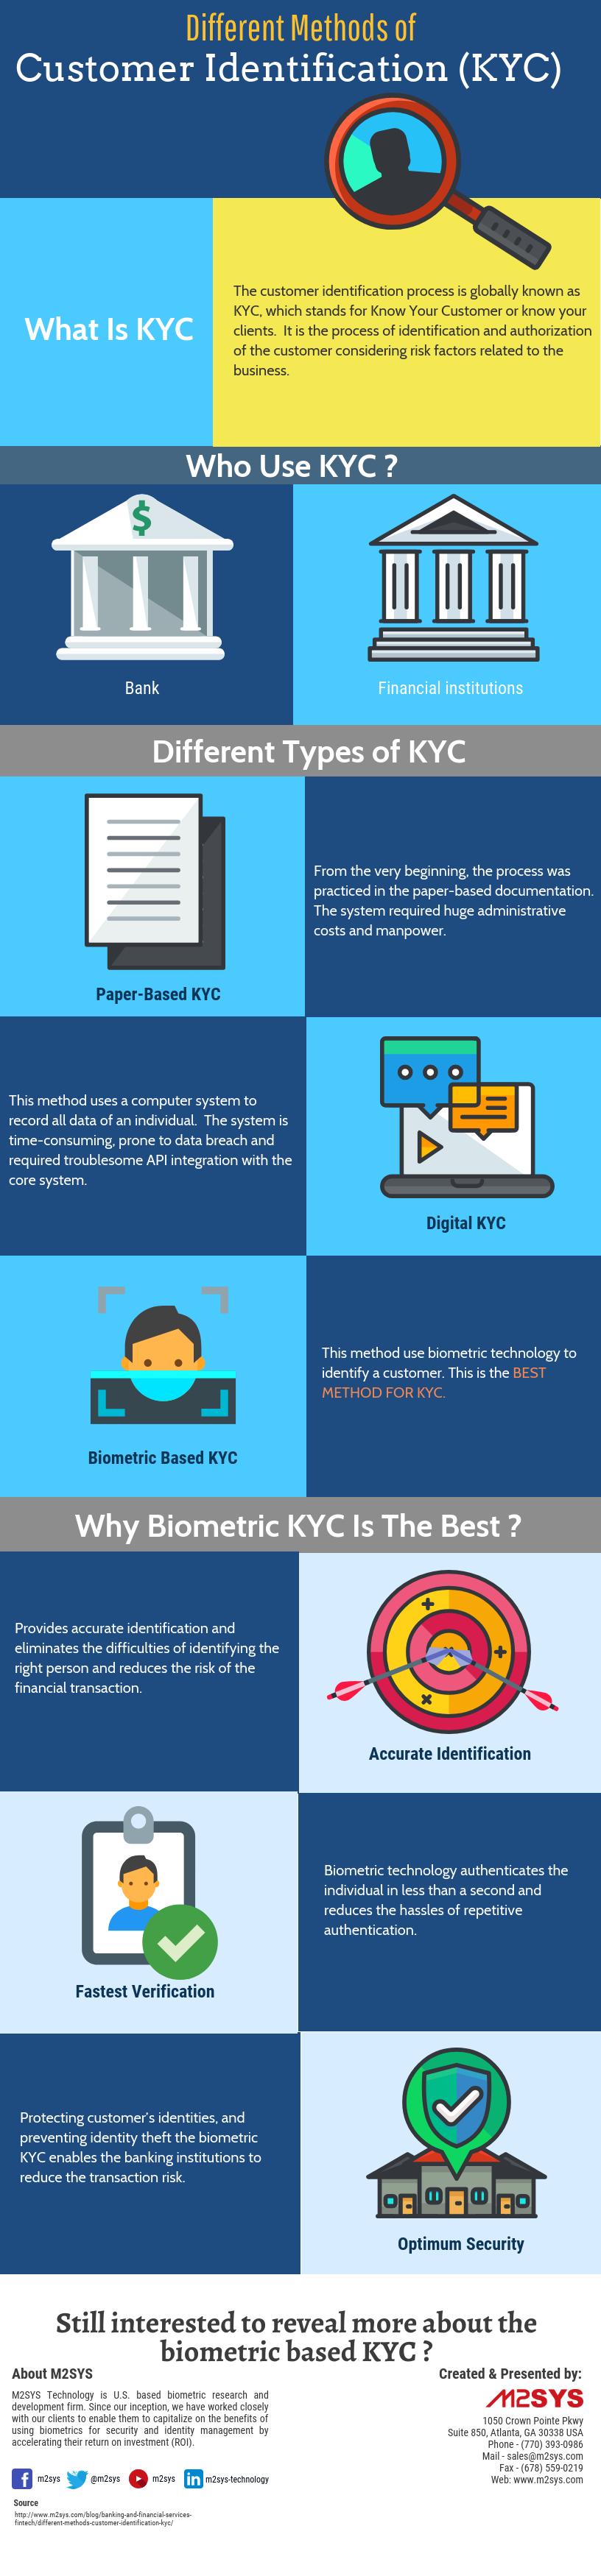 Different Methods of Customer Identification #infographic #Customer Identification #Biometric Technology #infographics #Biometric KYC